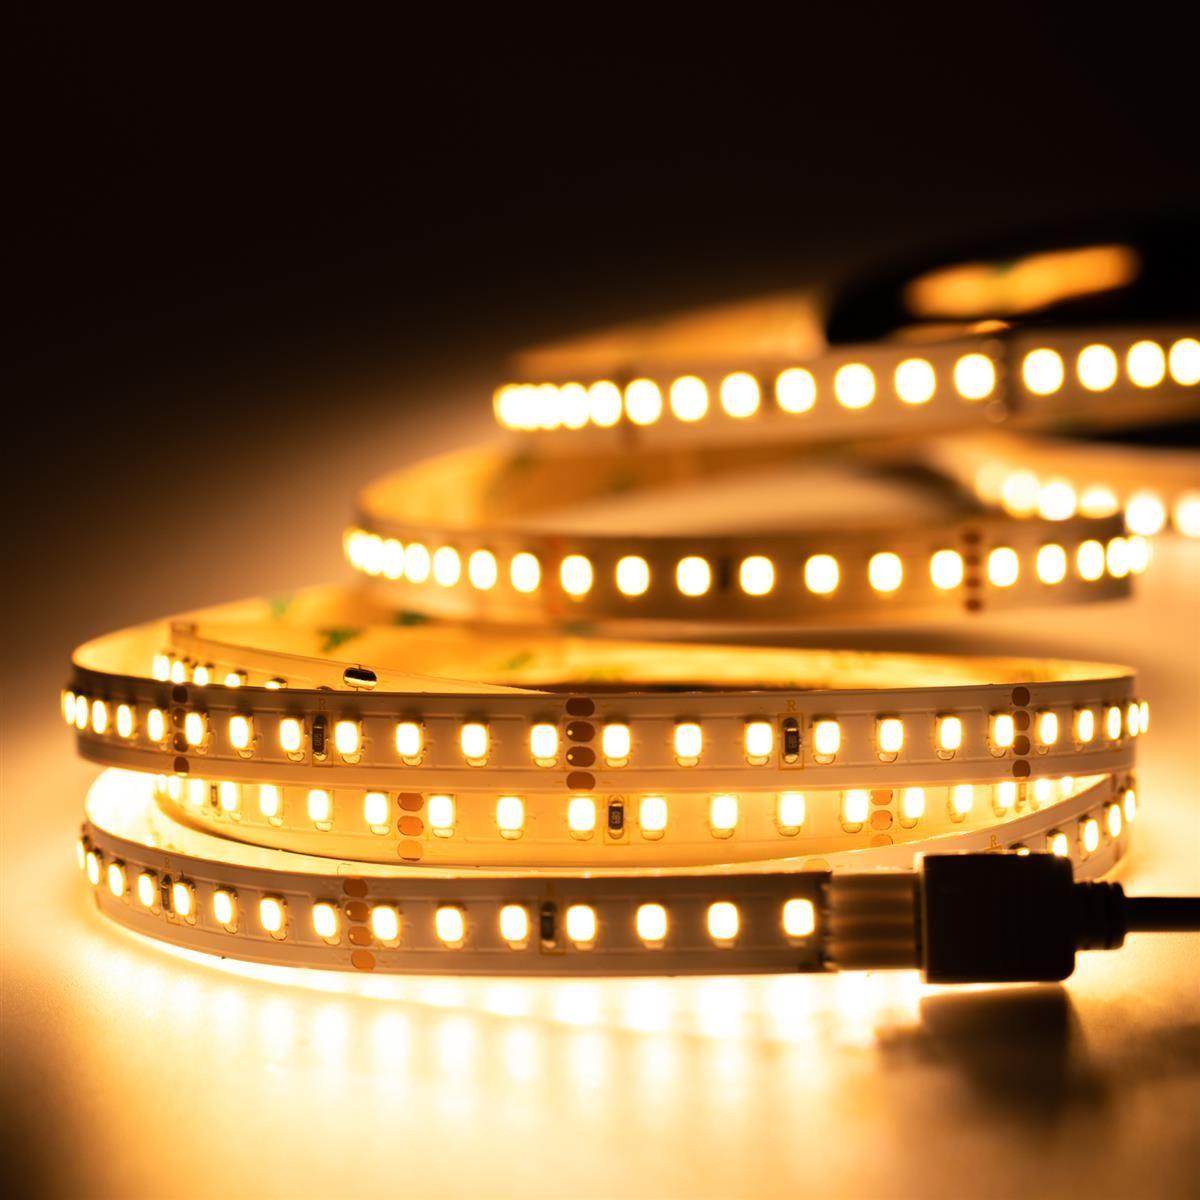 24V LED Streifen – warmweiß – 140 LEDs je Meter – alle 5cm teilbar